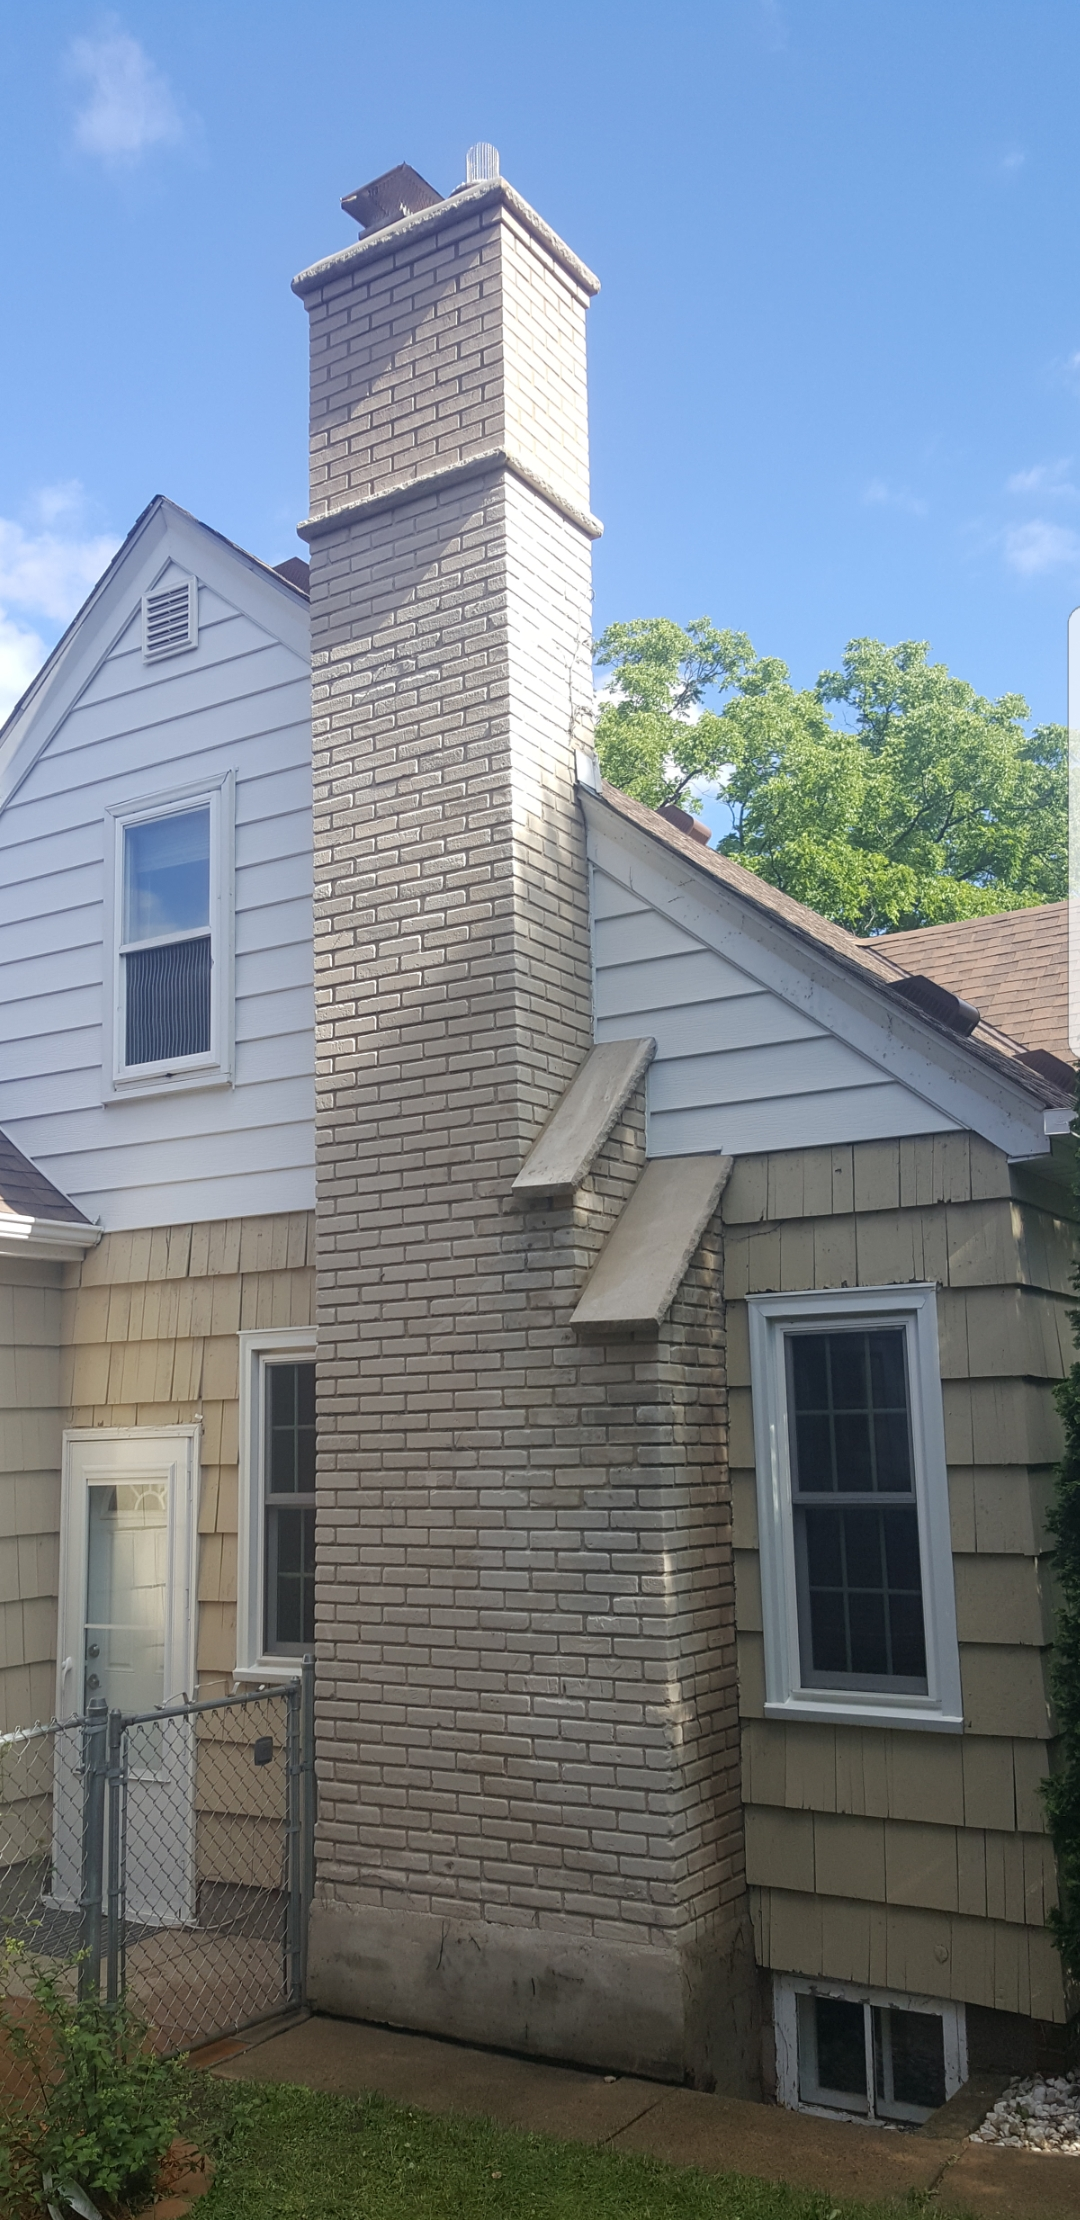 Brick Chimneys (45)